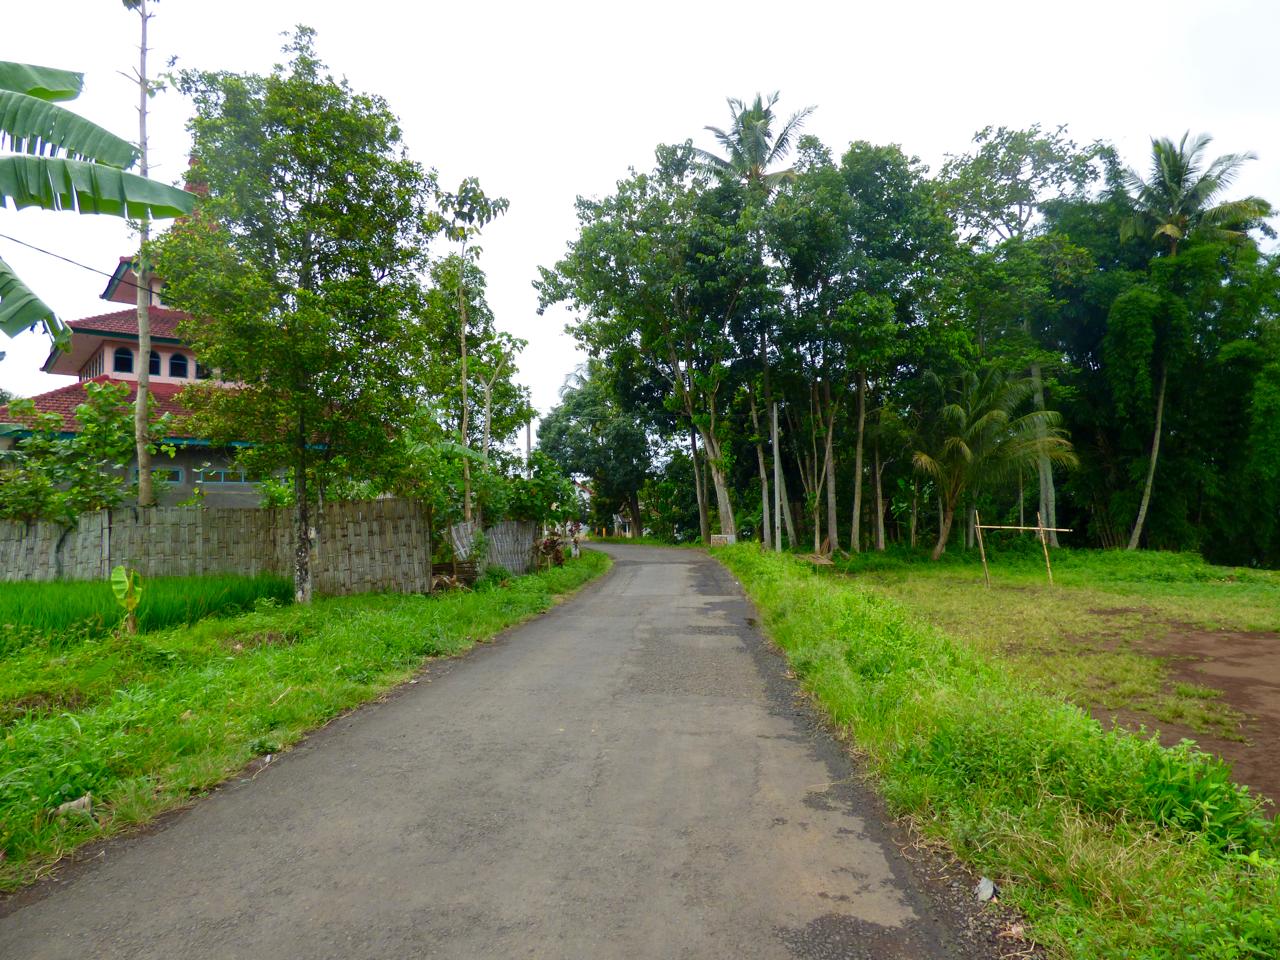 Rural Java, Indonesia